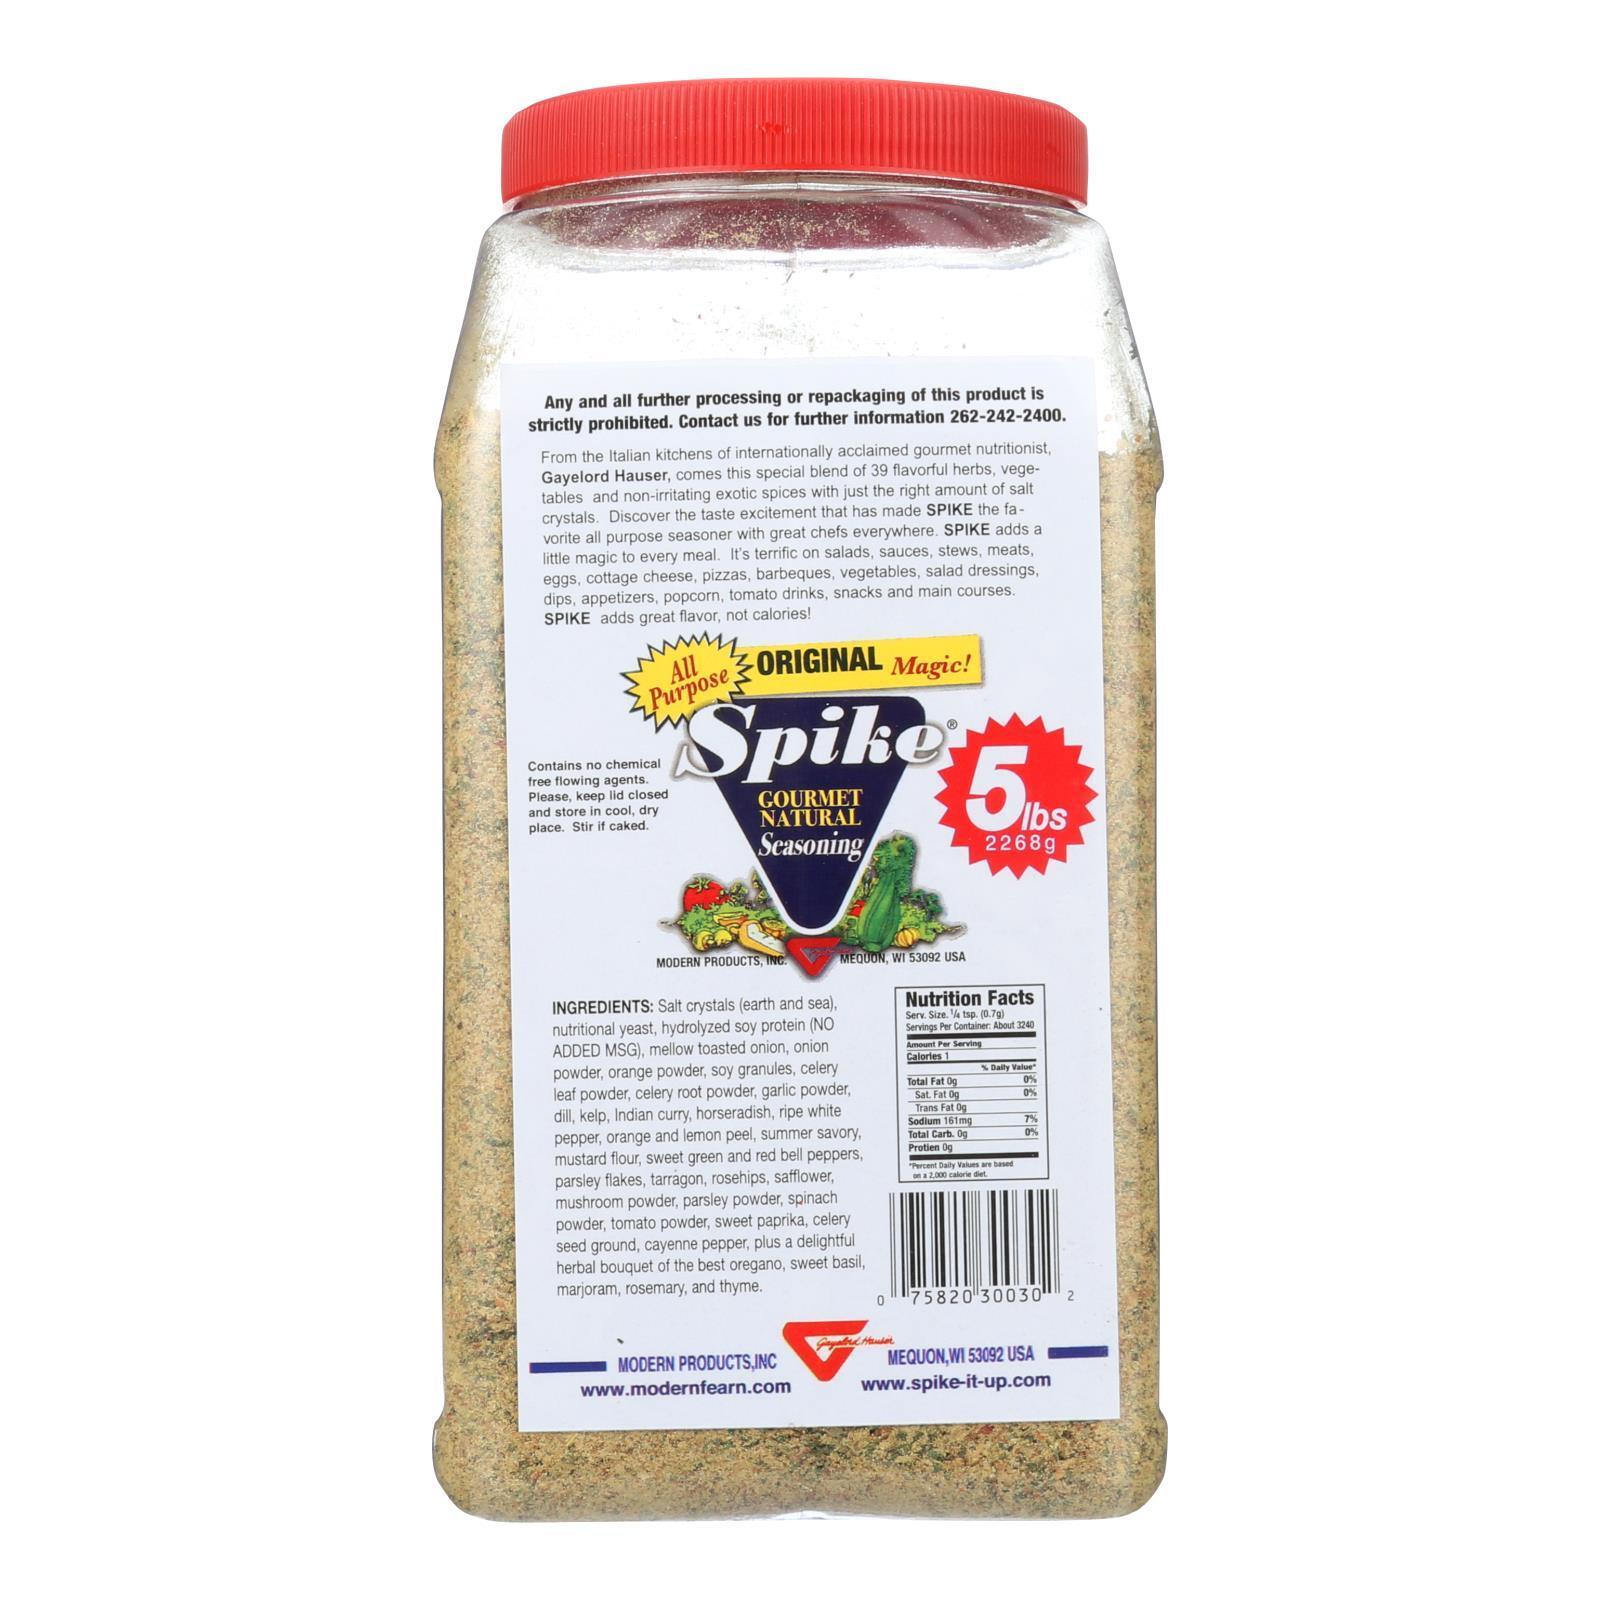 Modern Products Spike Gourmet Natural Seasoning - Bulk - 5 lb